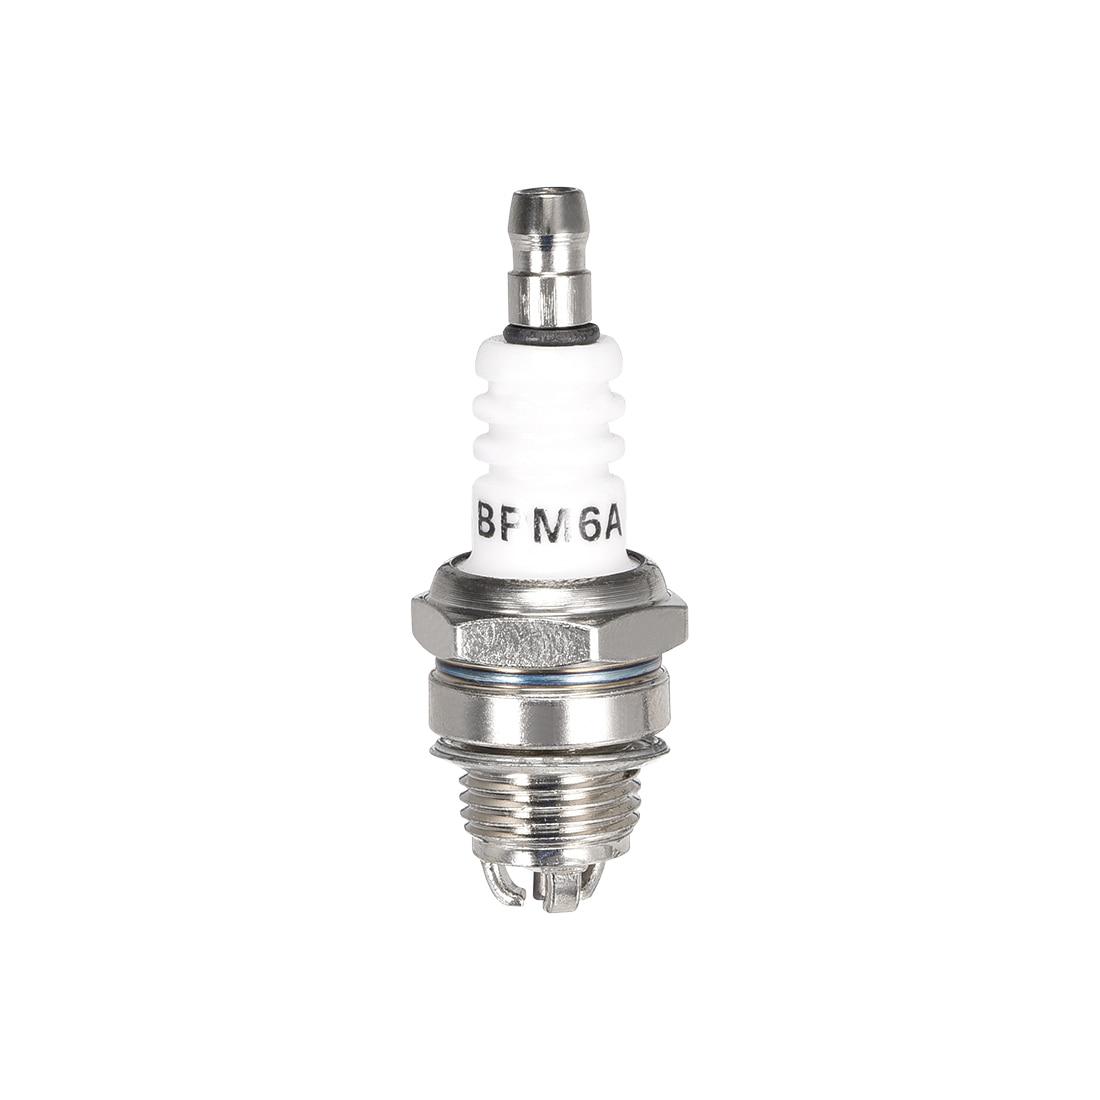 Uxcell Bpm6a Spark Plug 3 Electrode For Generator